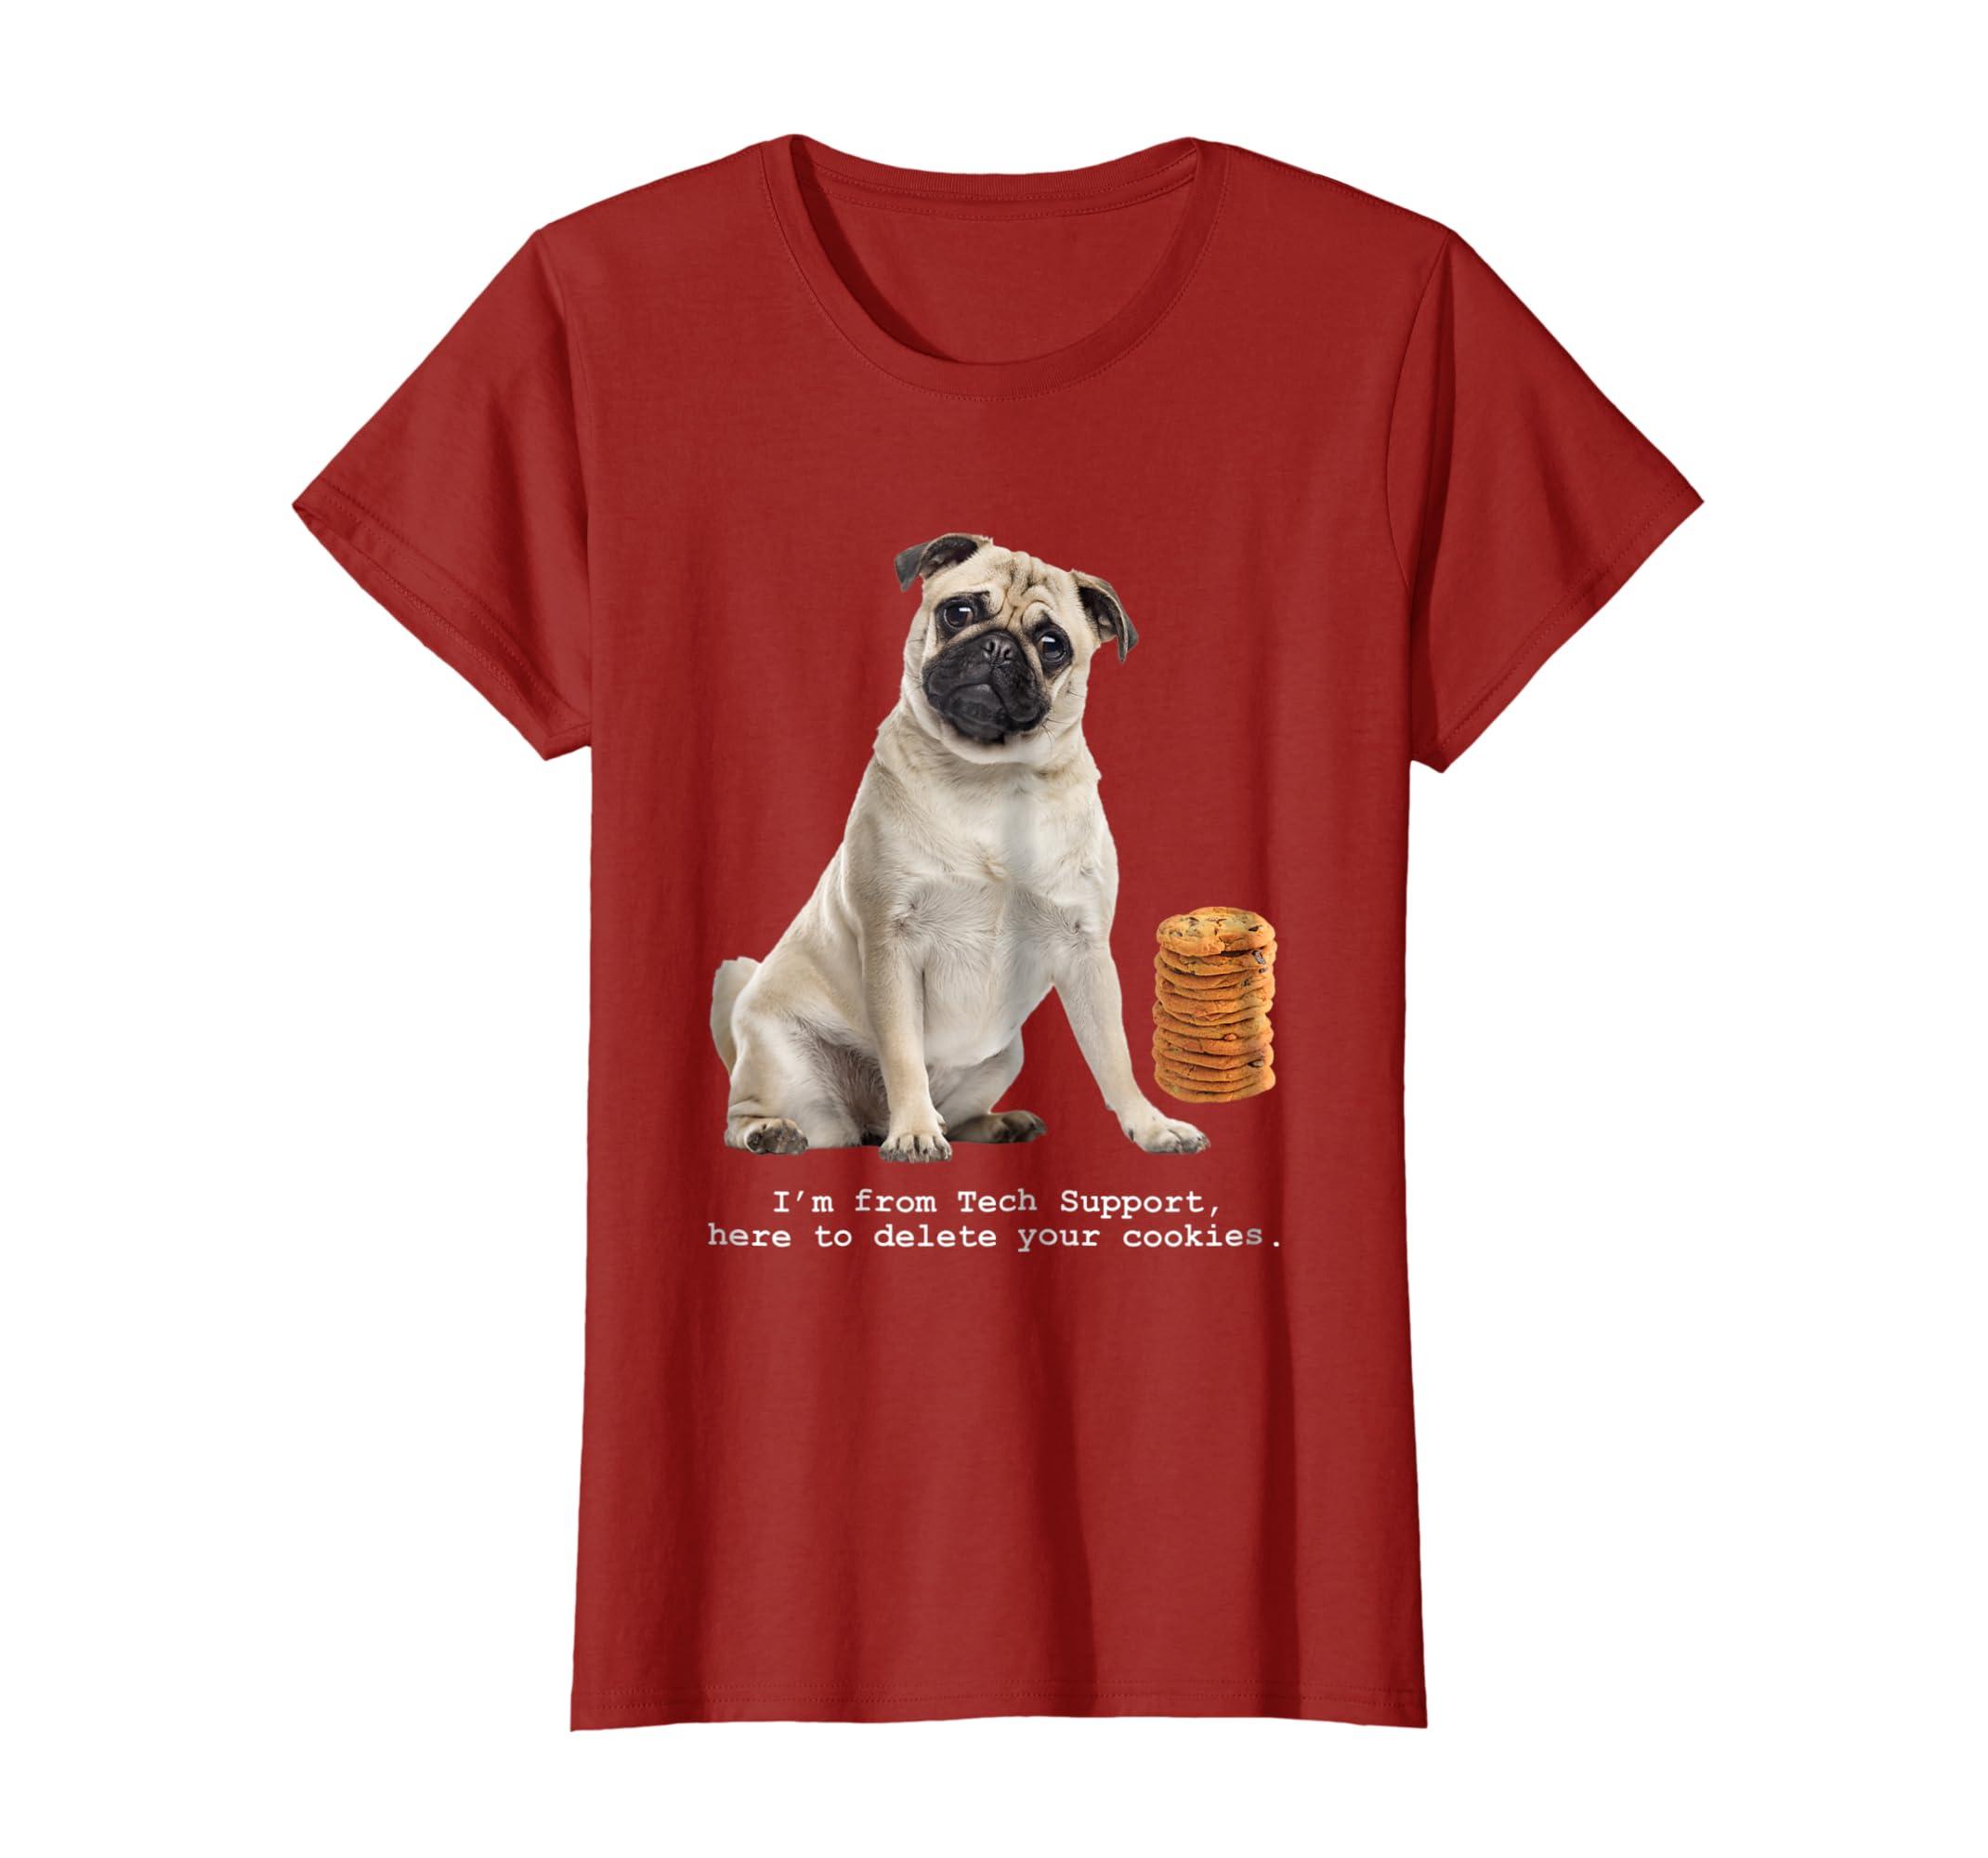 b06ab930d Amazon.com: Delete Cookies T-Shirt for Pug Dog Lovers & I.T. IT Tech Web:  Clothing